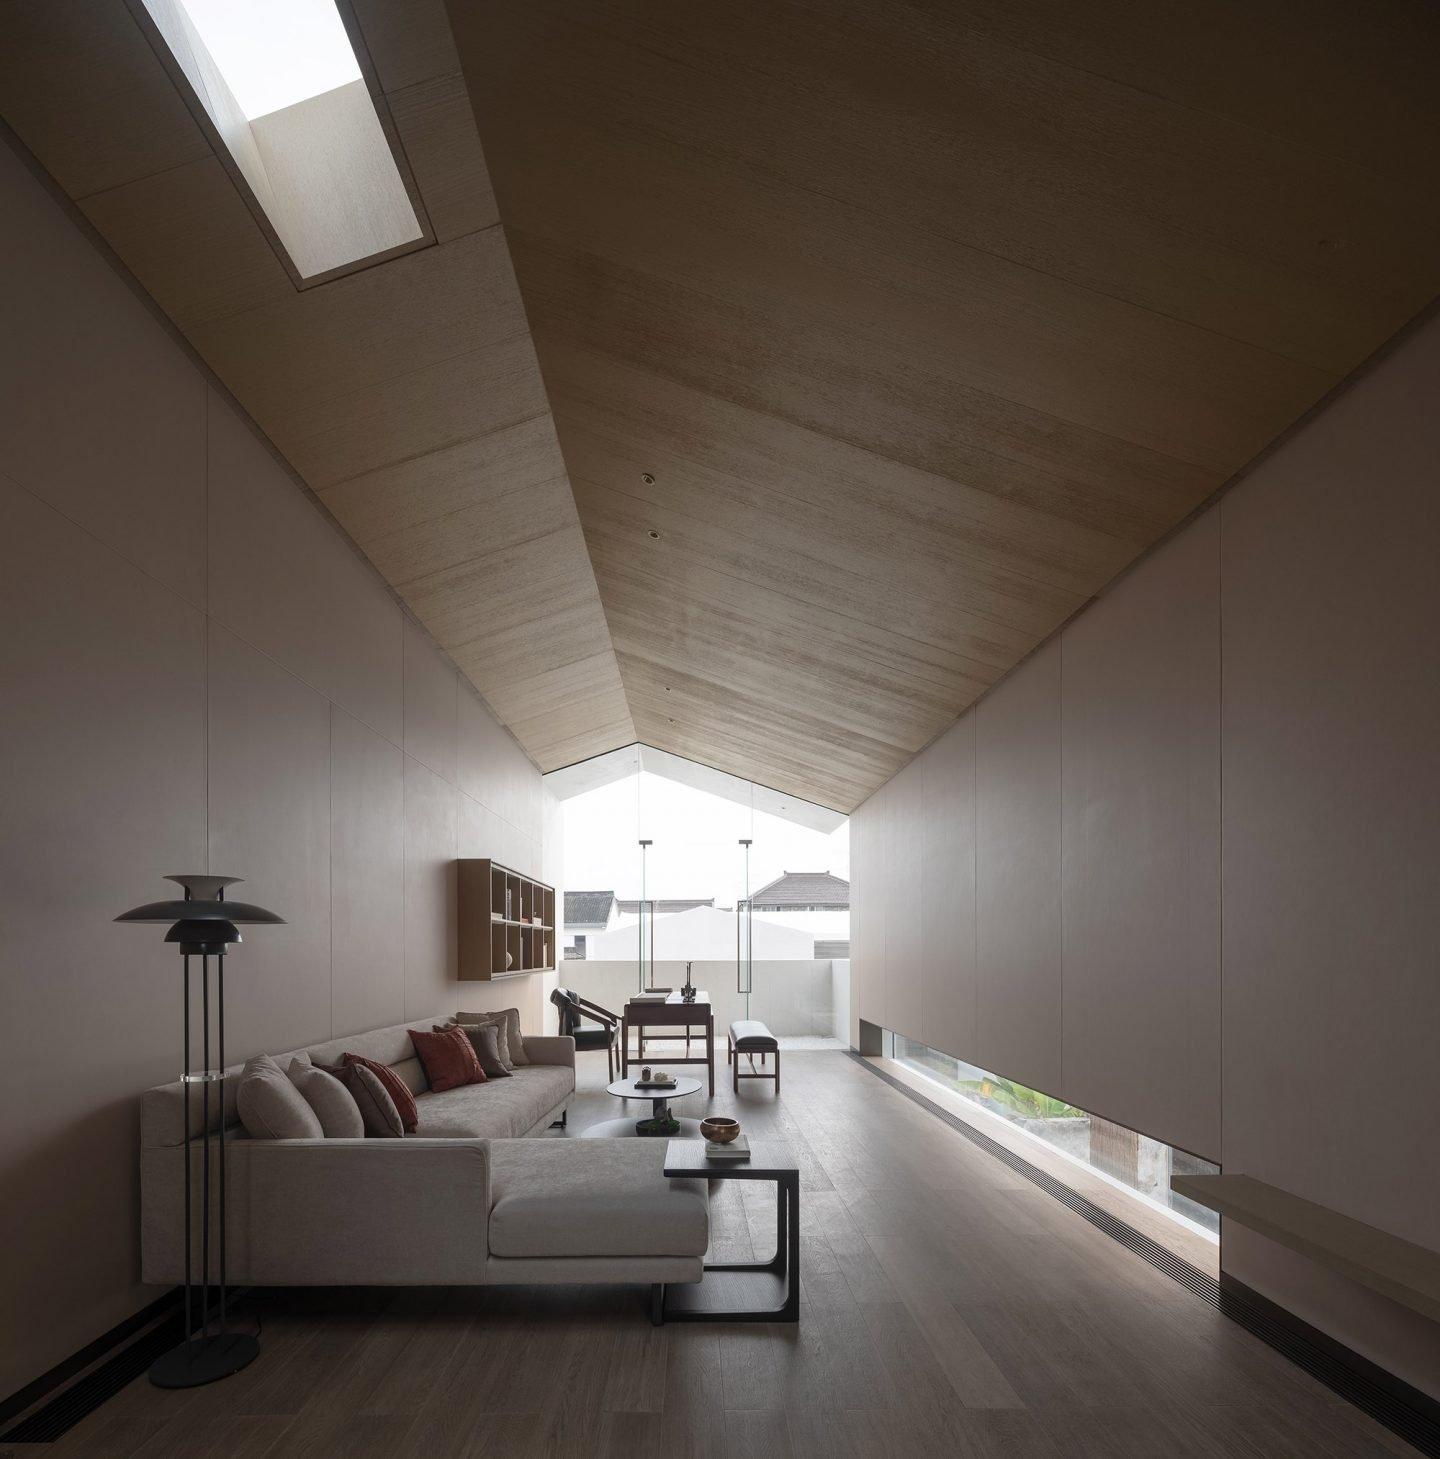 IGNANT-Architecture-HorizontalDesign-ZhangYanCulturalMuseum-13